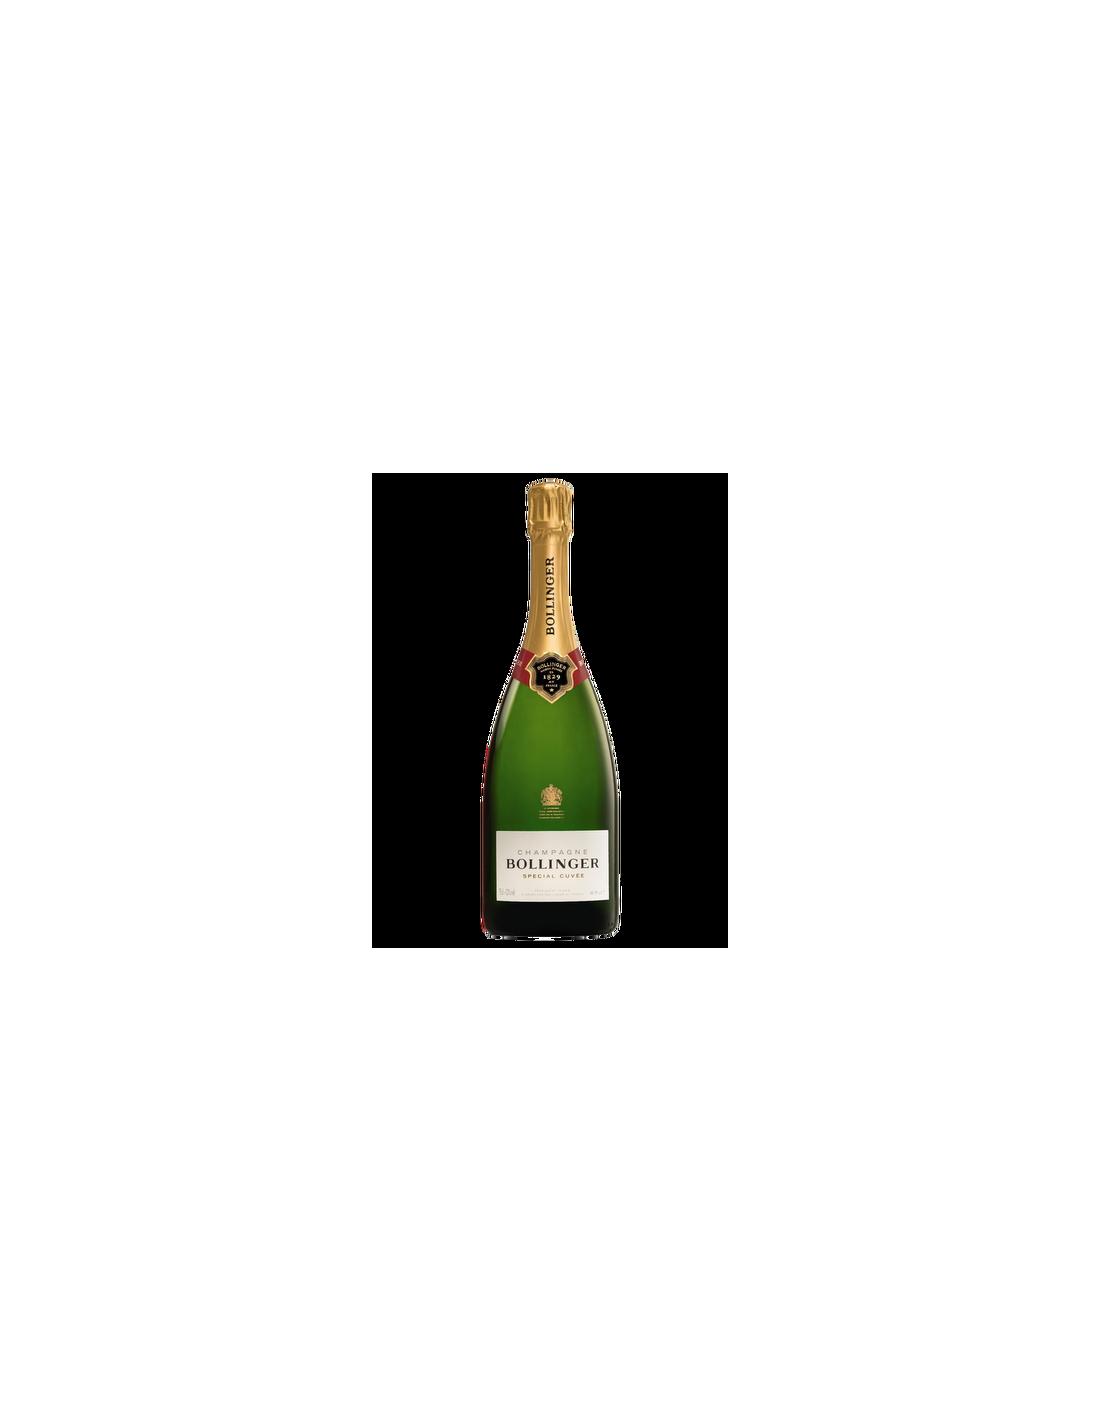 Sampanie Bollinger Brut Special Cuvee Champagne, 0.75L, 12% alc., Franta